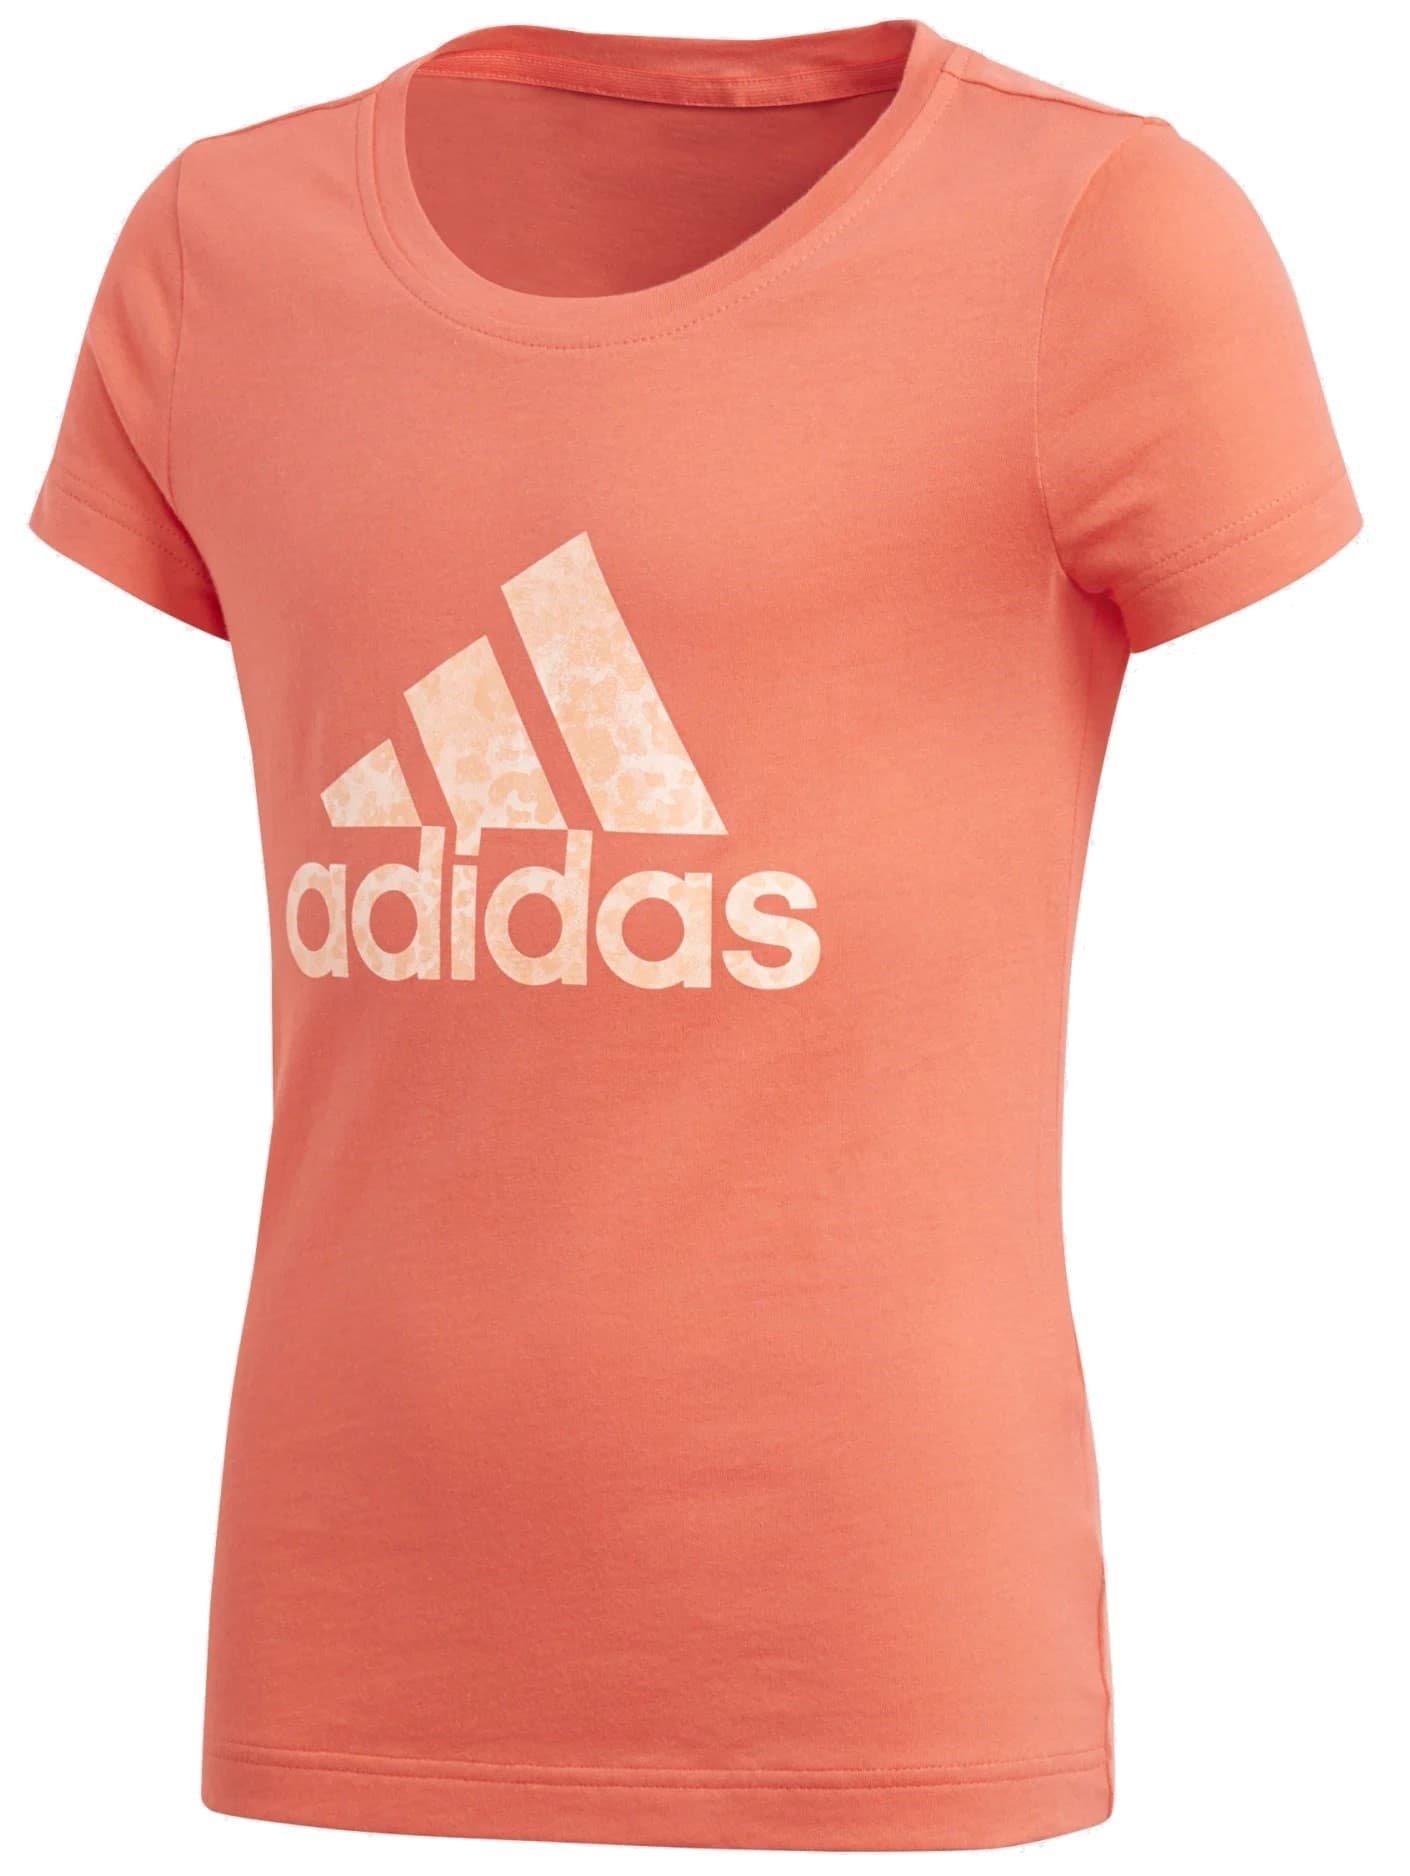 Adidas Essentials Performance Logo Tee Girl 116